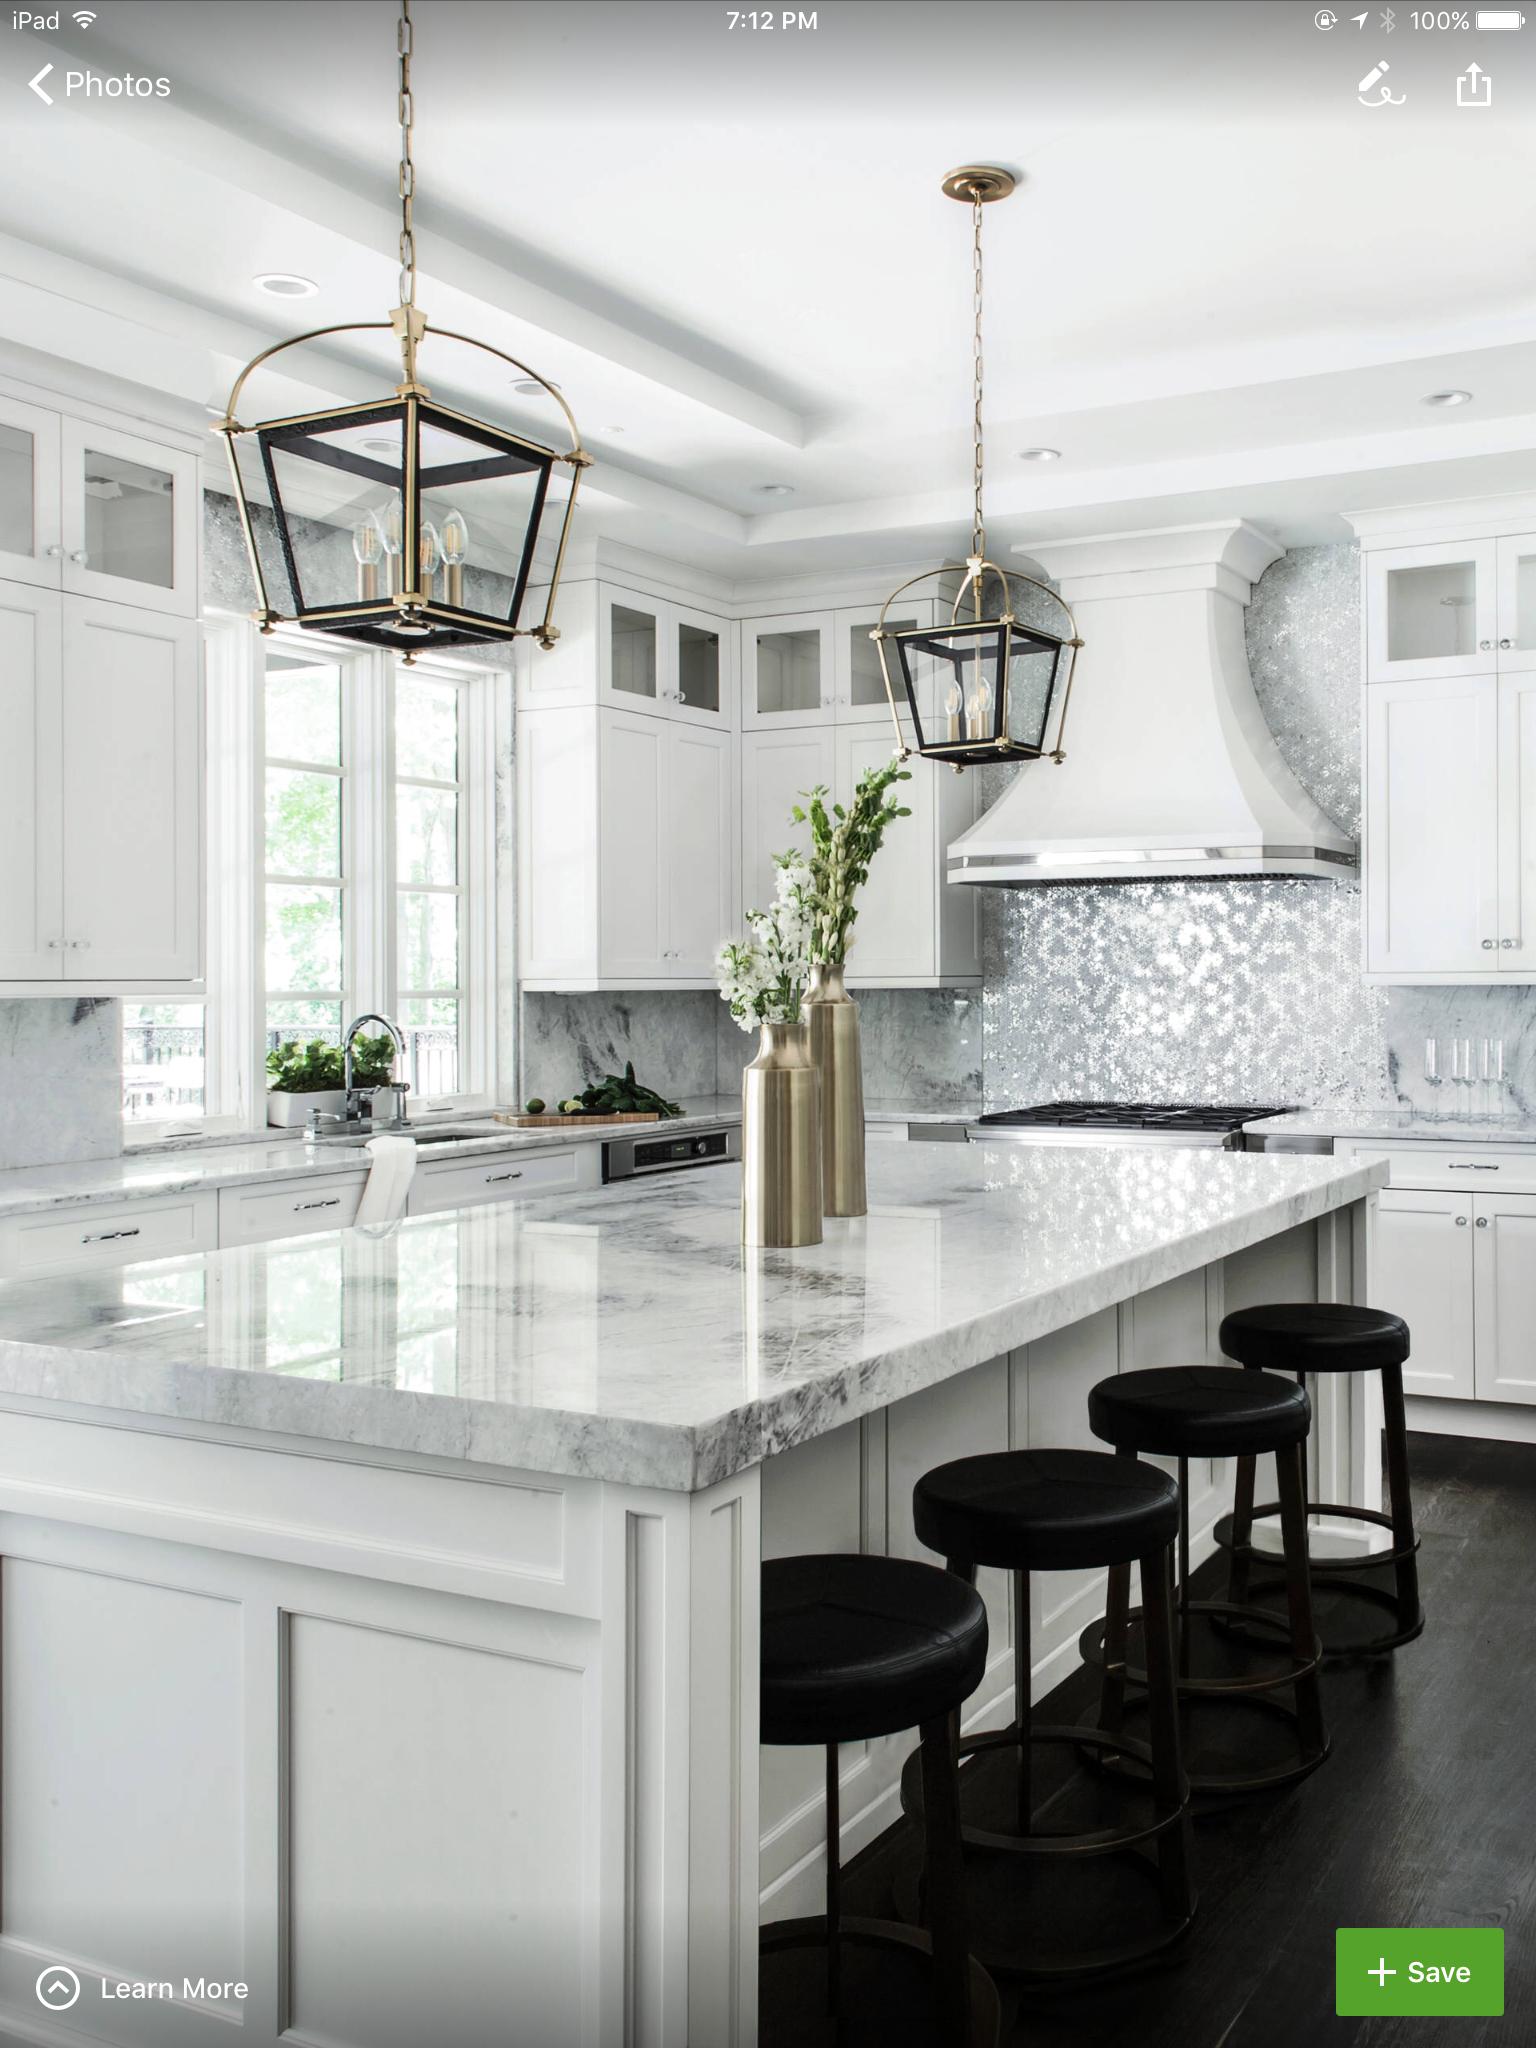 Pin By Michelle S Interiors On Cabinet Details Kitchen Cabinets Decor White Kitchen Design Home Decor Kitchen